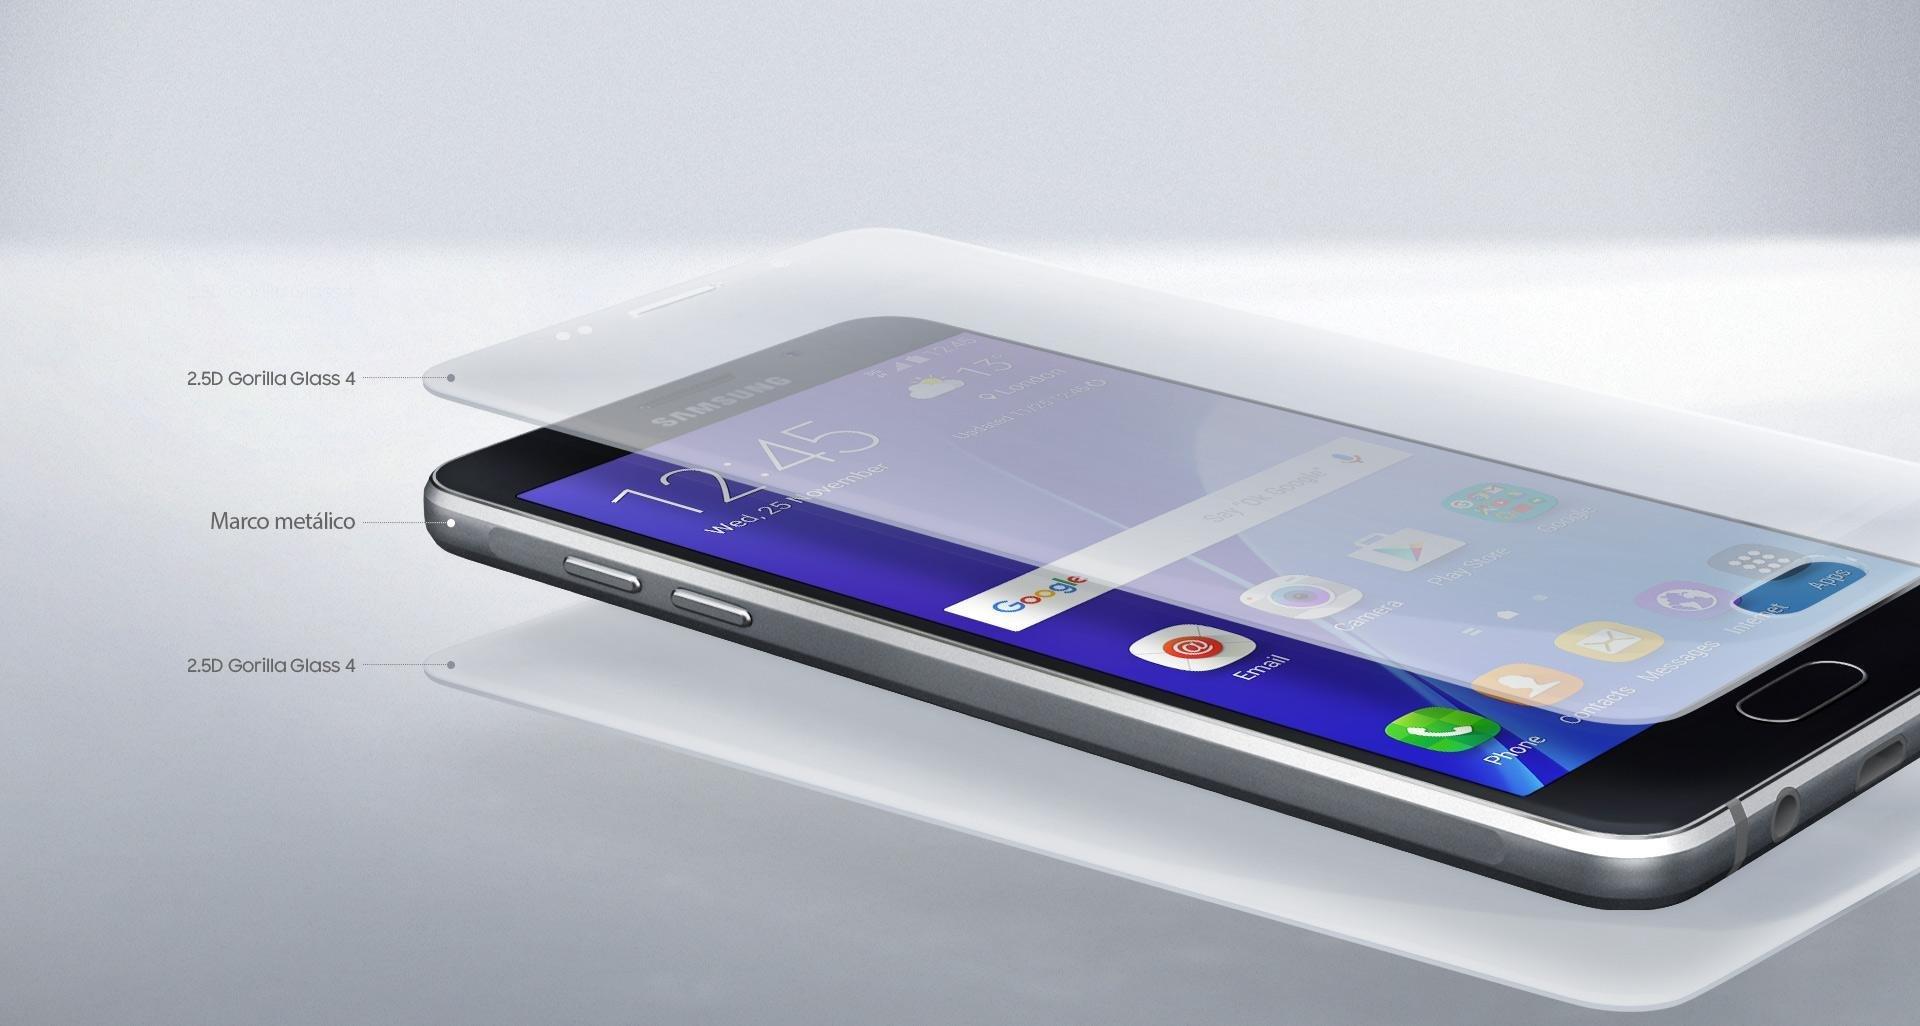 Oferta Samsung Galaxy A3 por 179 euros. Ahorra 20 euros 1 samsung galaxy S6